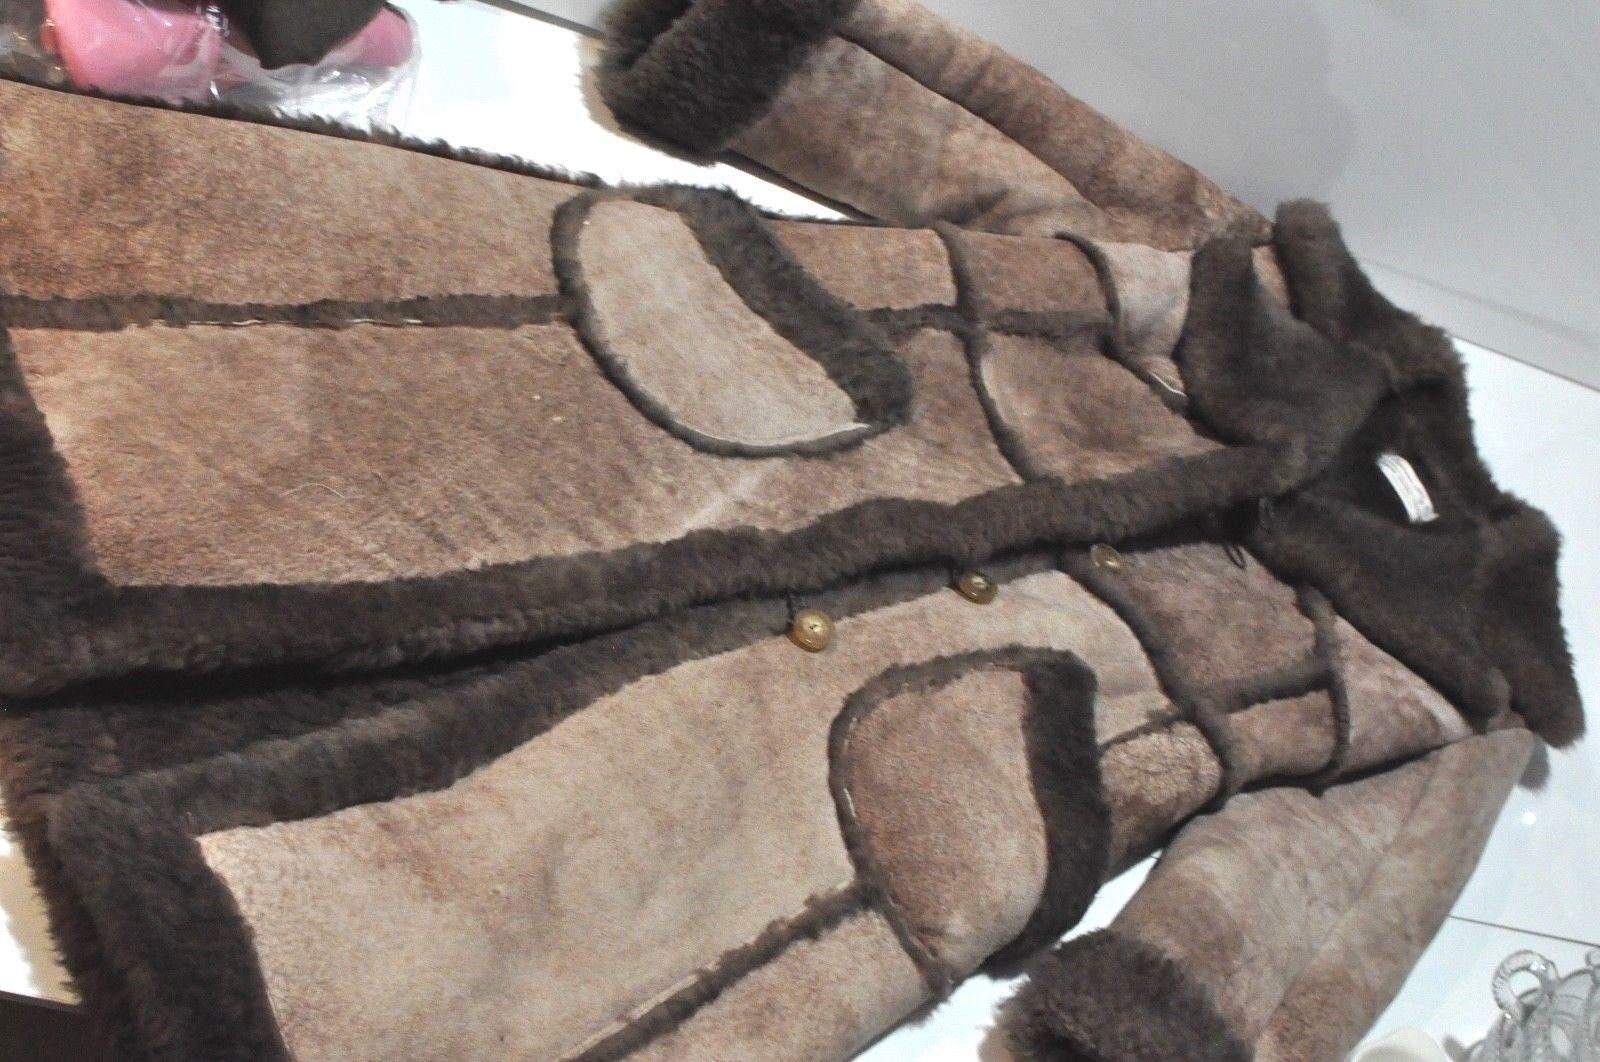 Vintage Sportsman Mfg Mfg Mfg Co. genuine sheepskin Coat Berlin Wisconsin Womens sz 6 42e7fa